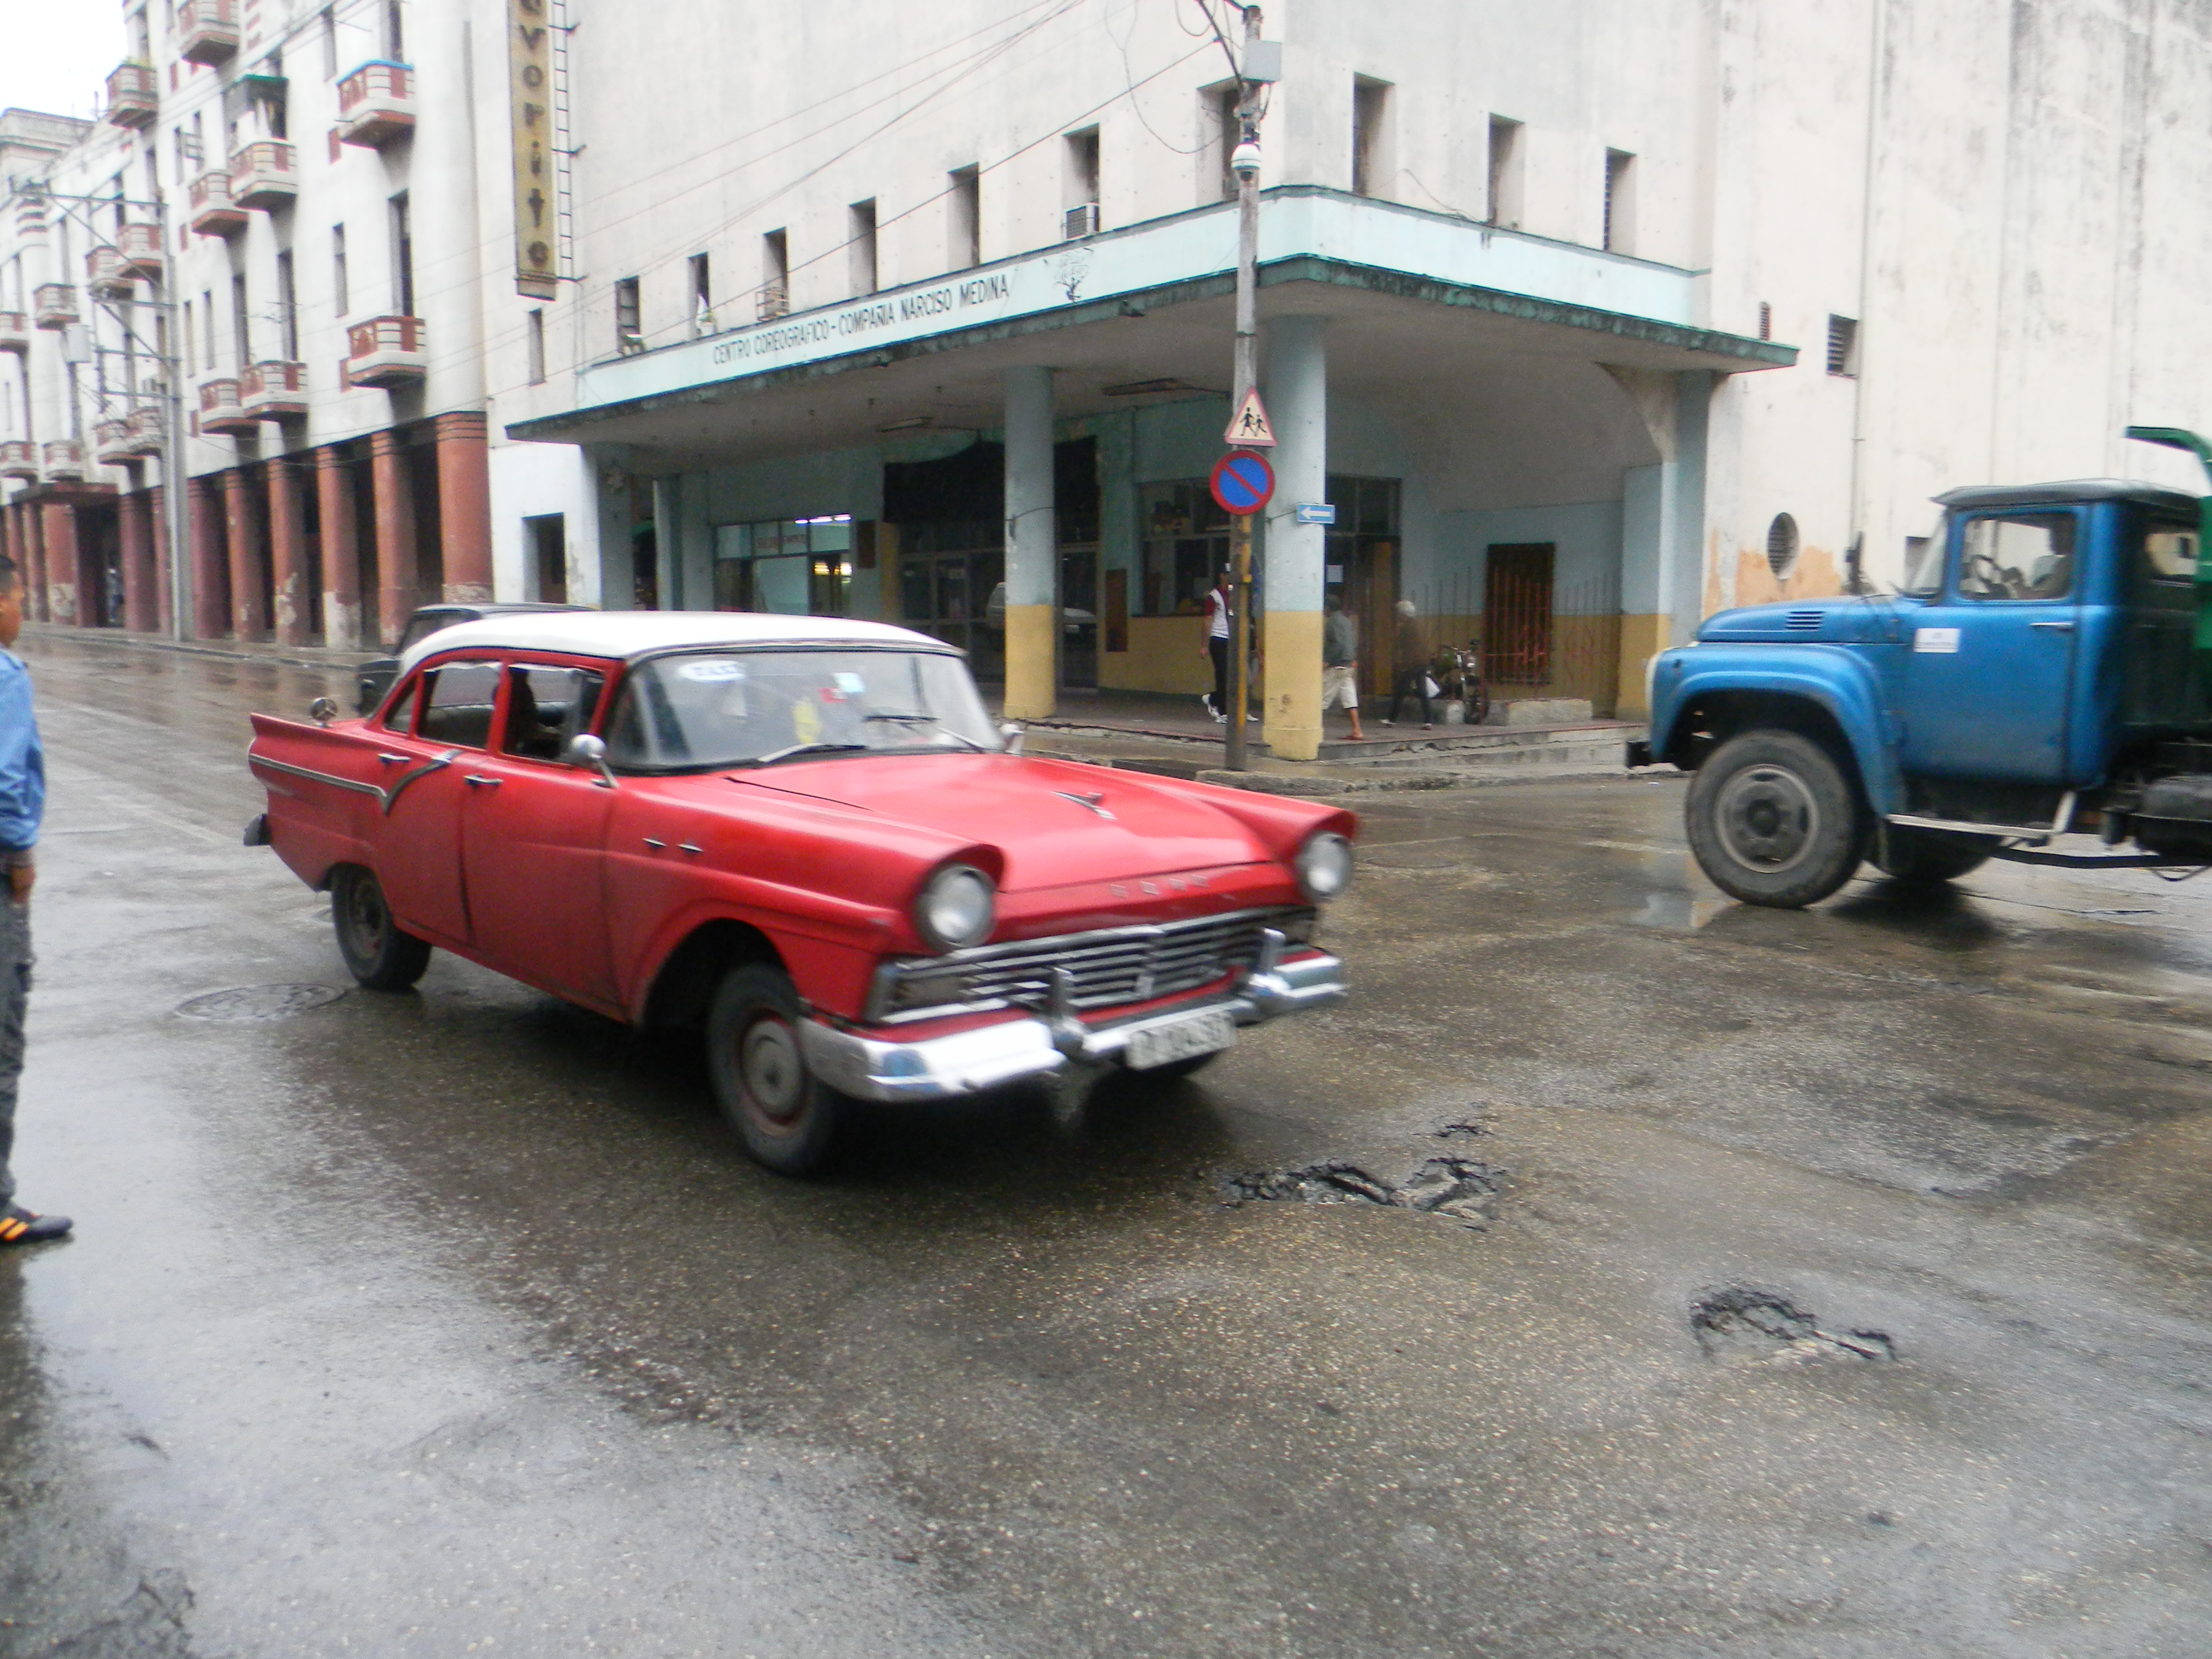 File:Classic cars in Cuba, Havana - Laslovarga031.JPG - Wikimedia ...